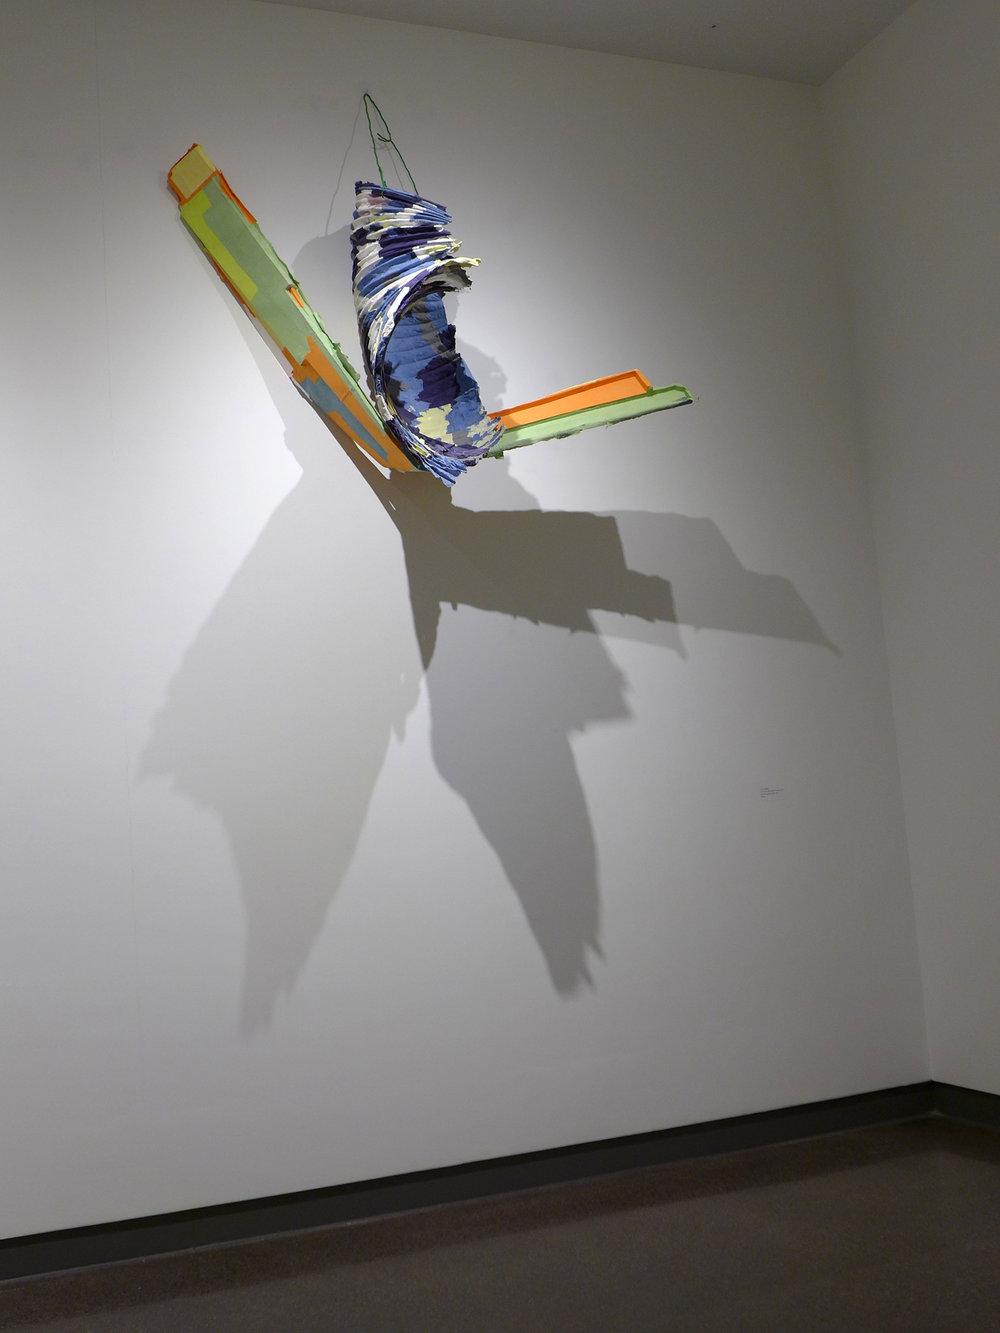 Landes_Sullivan_paper sculpture_690.jpg